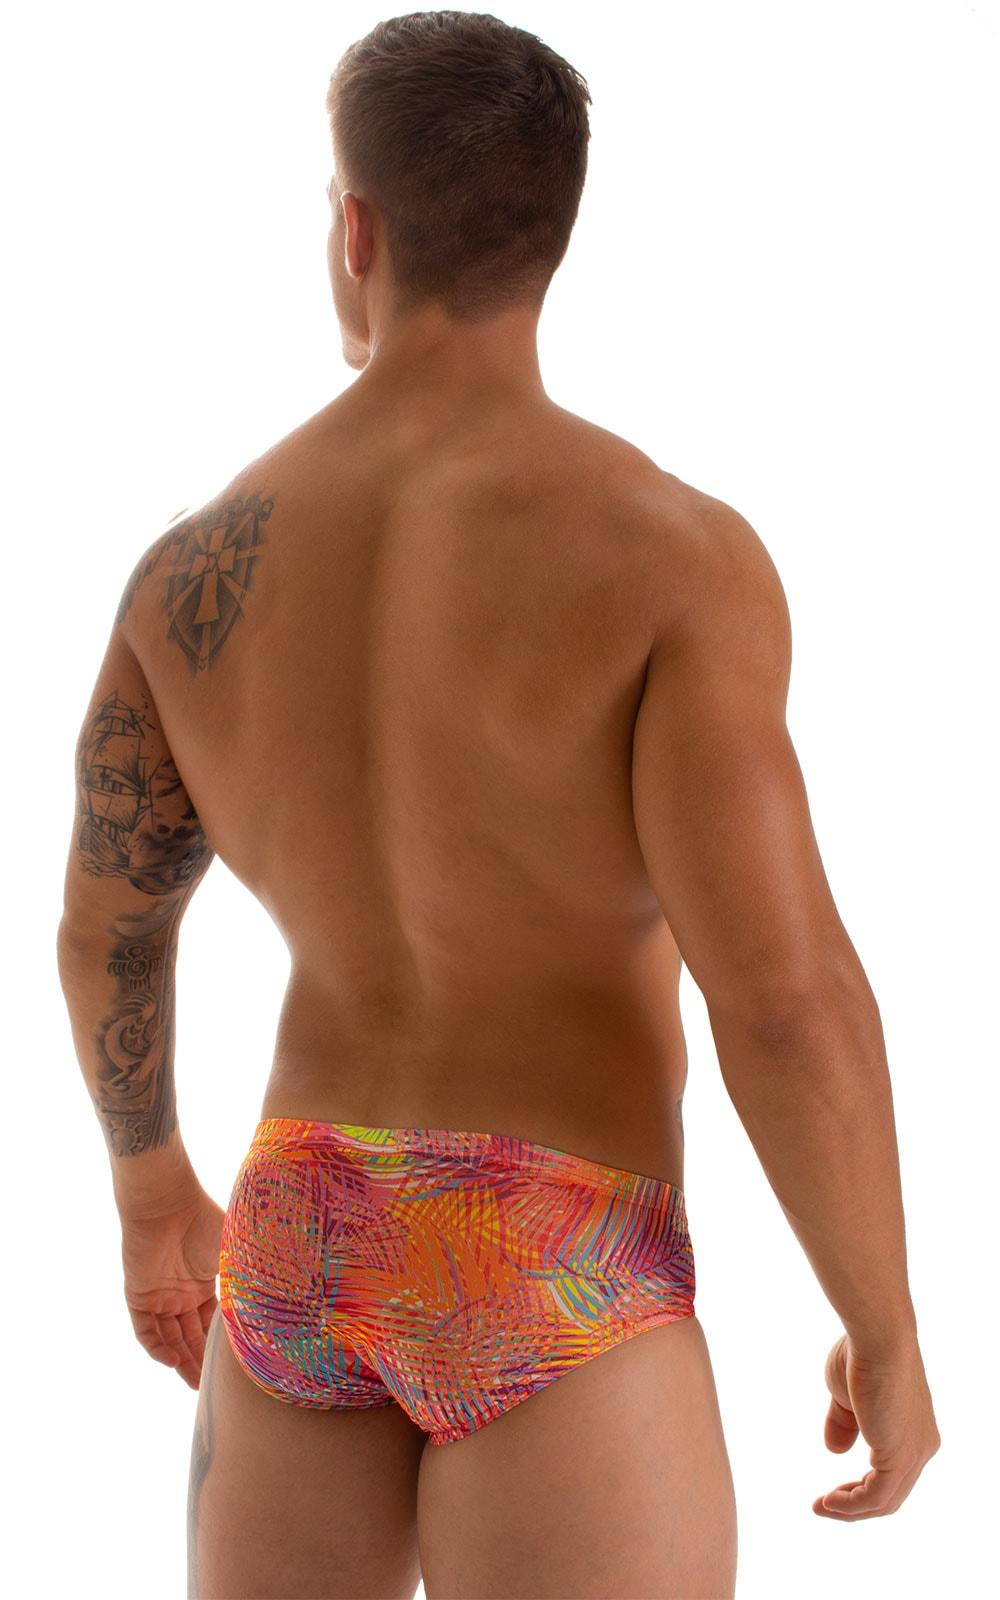 Pouch Brief Swimsuit in Tan Through Orange Jungle 5